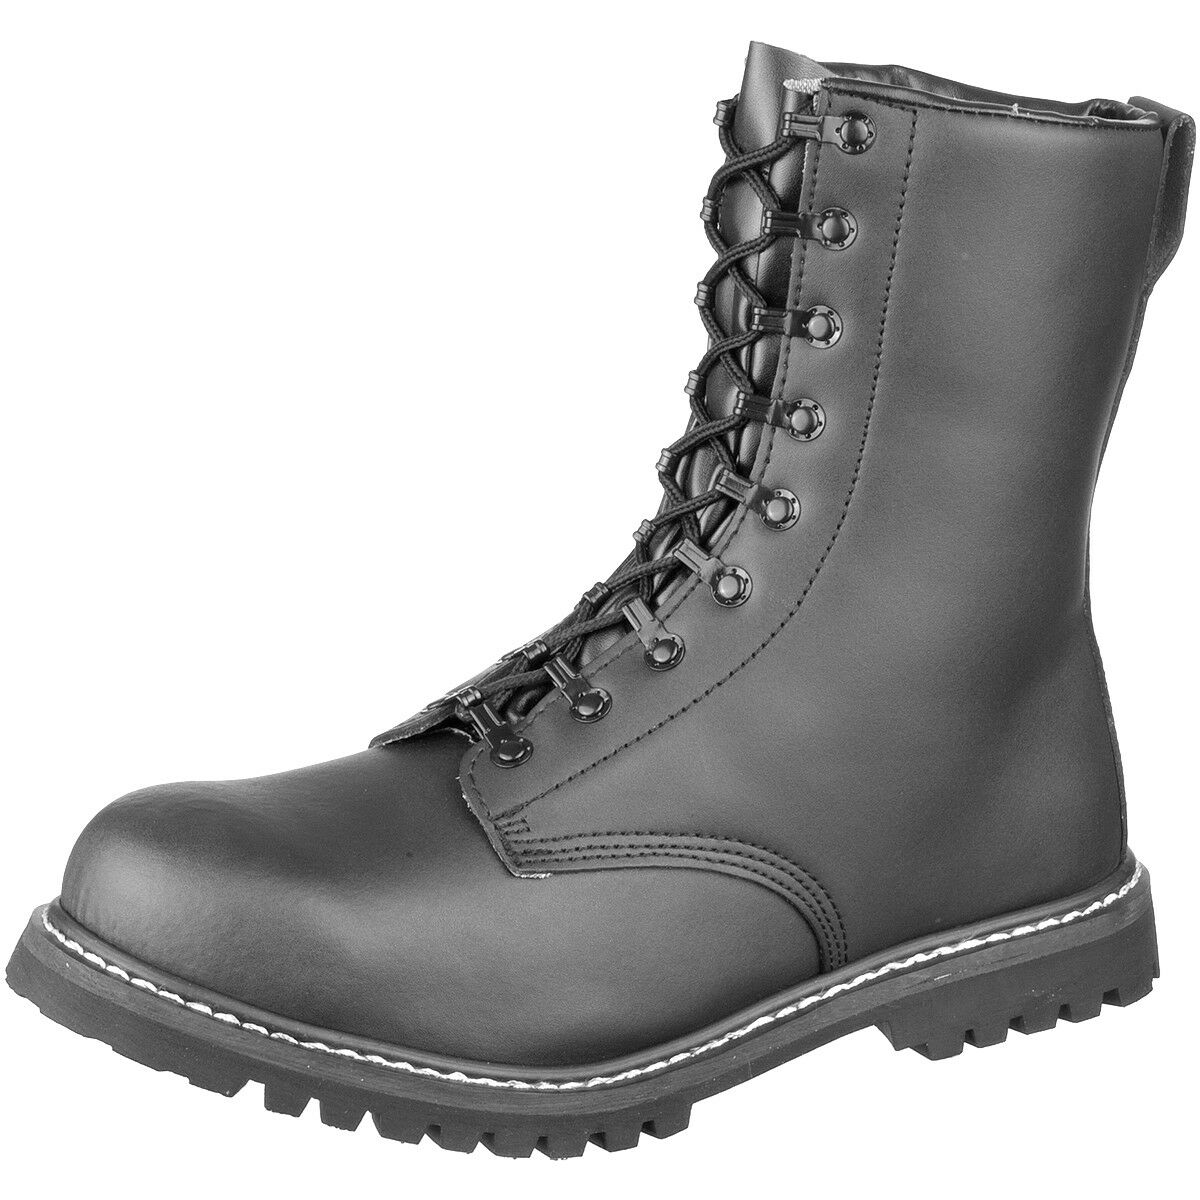 Brandit Combat Para Boots Faux Fur Steel Cup Leather Security Footwear Black